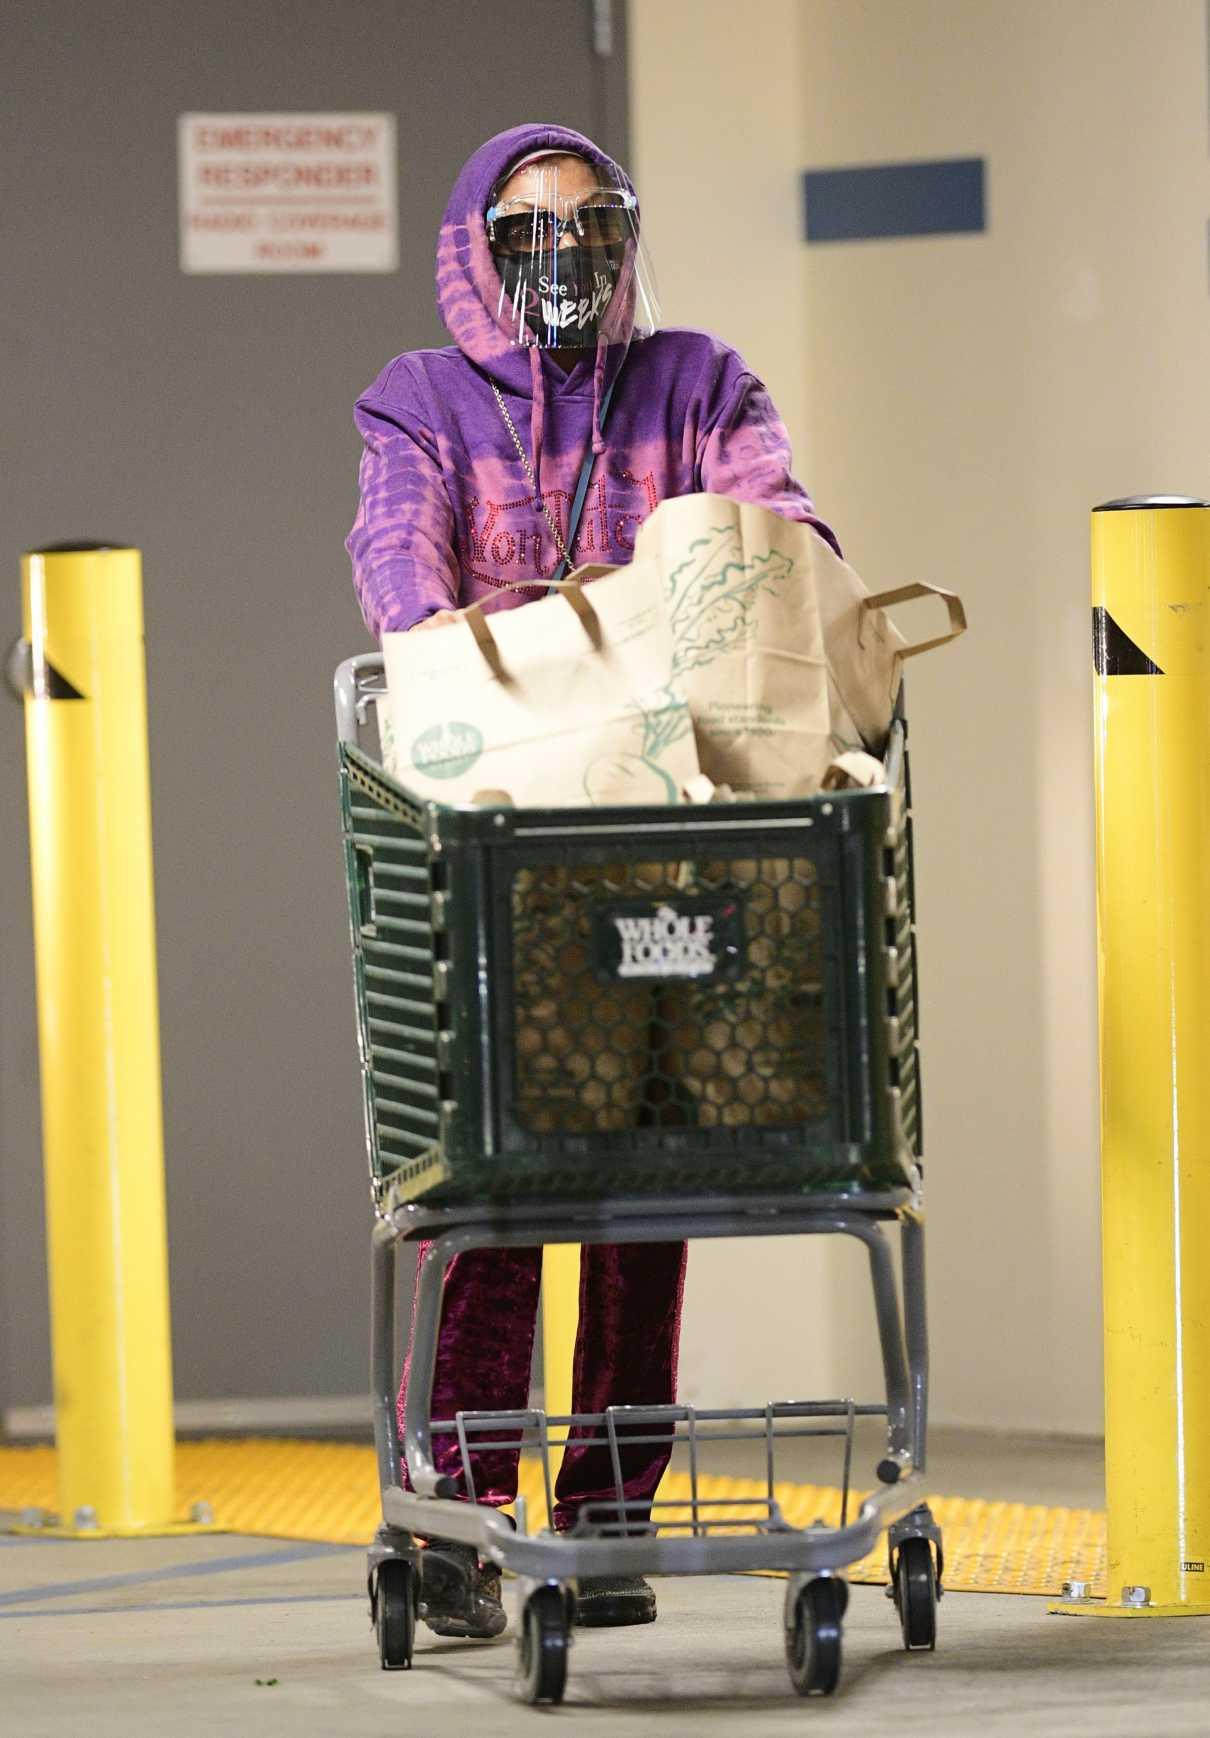 Taraji P. Henson in a Purple Hoodie